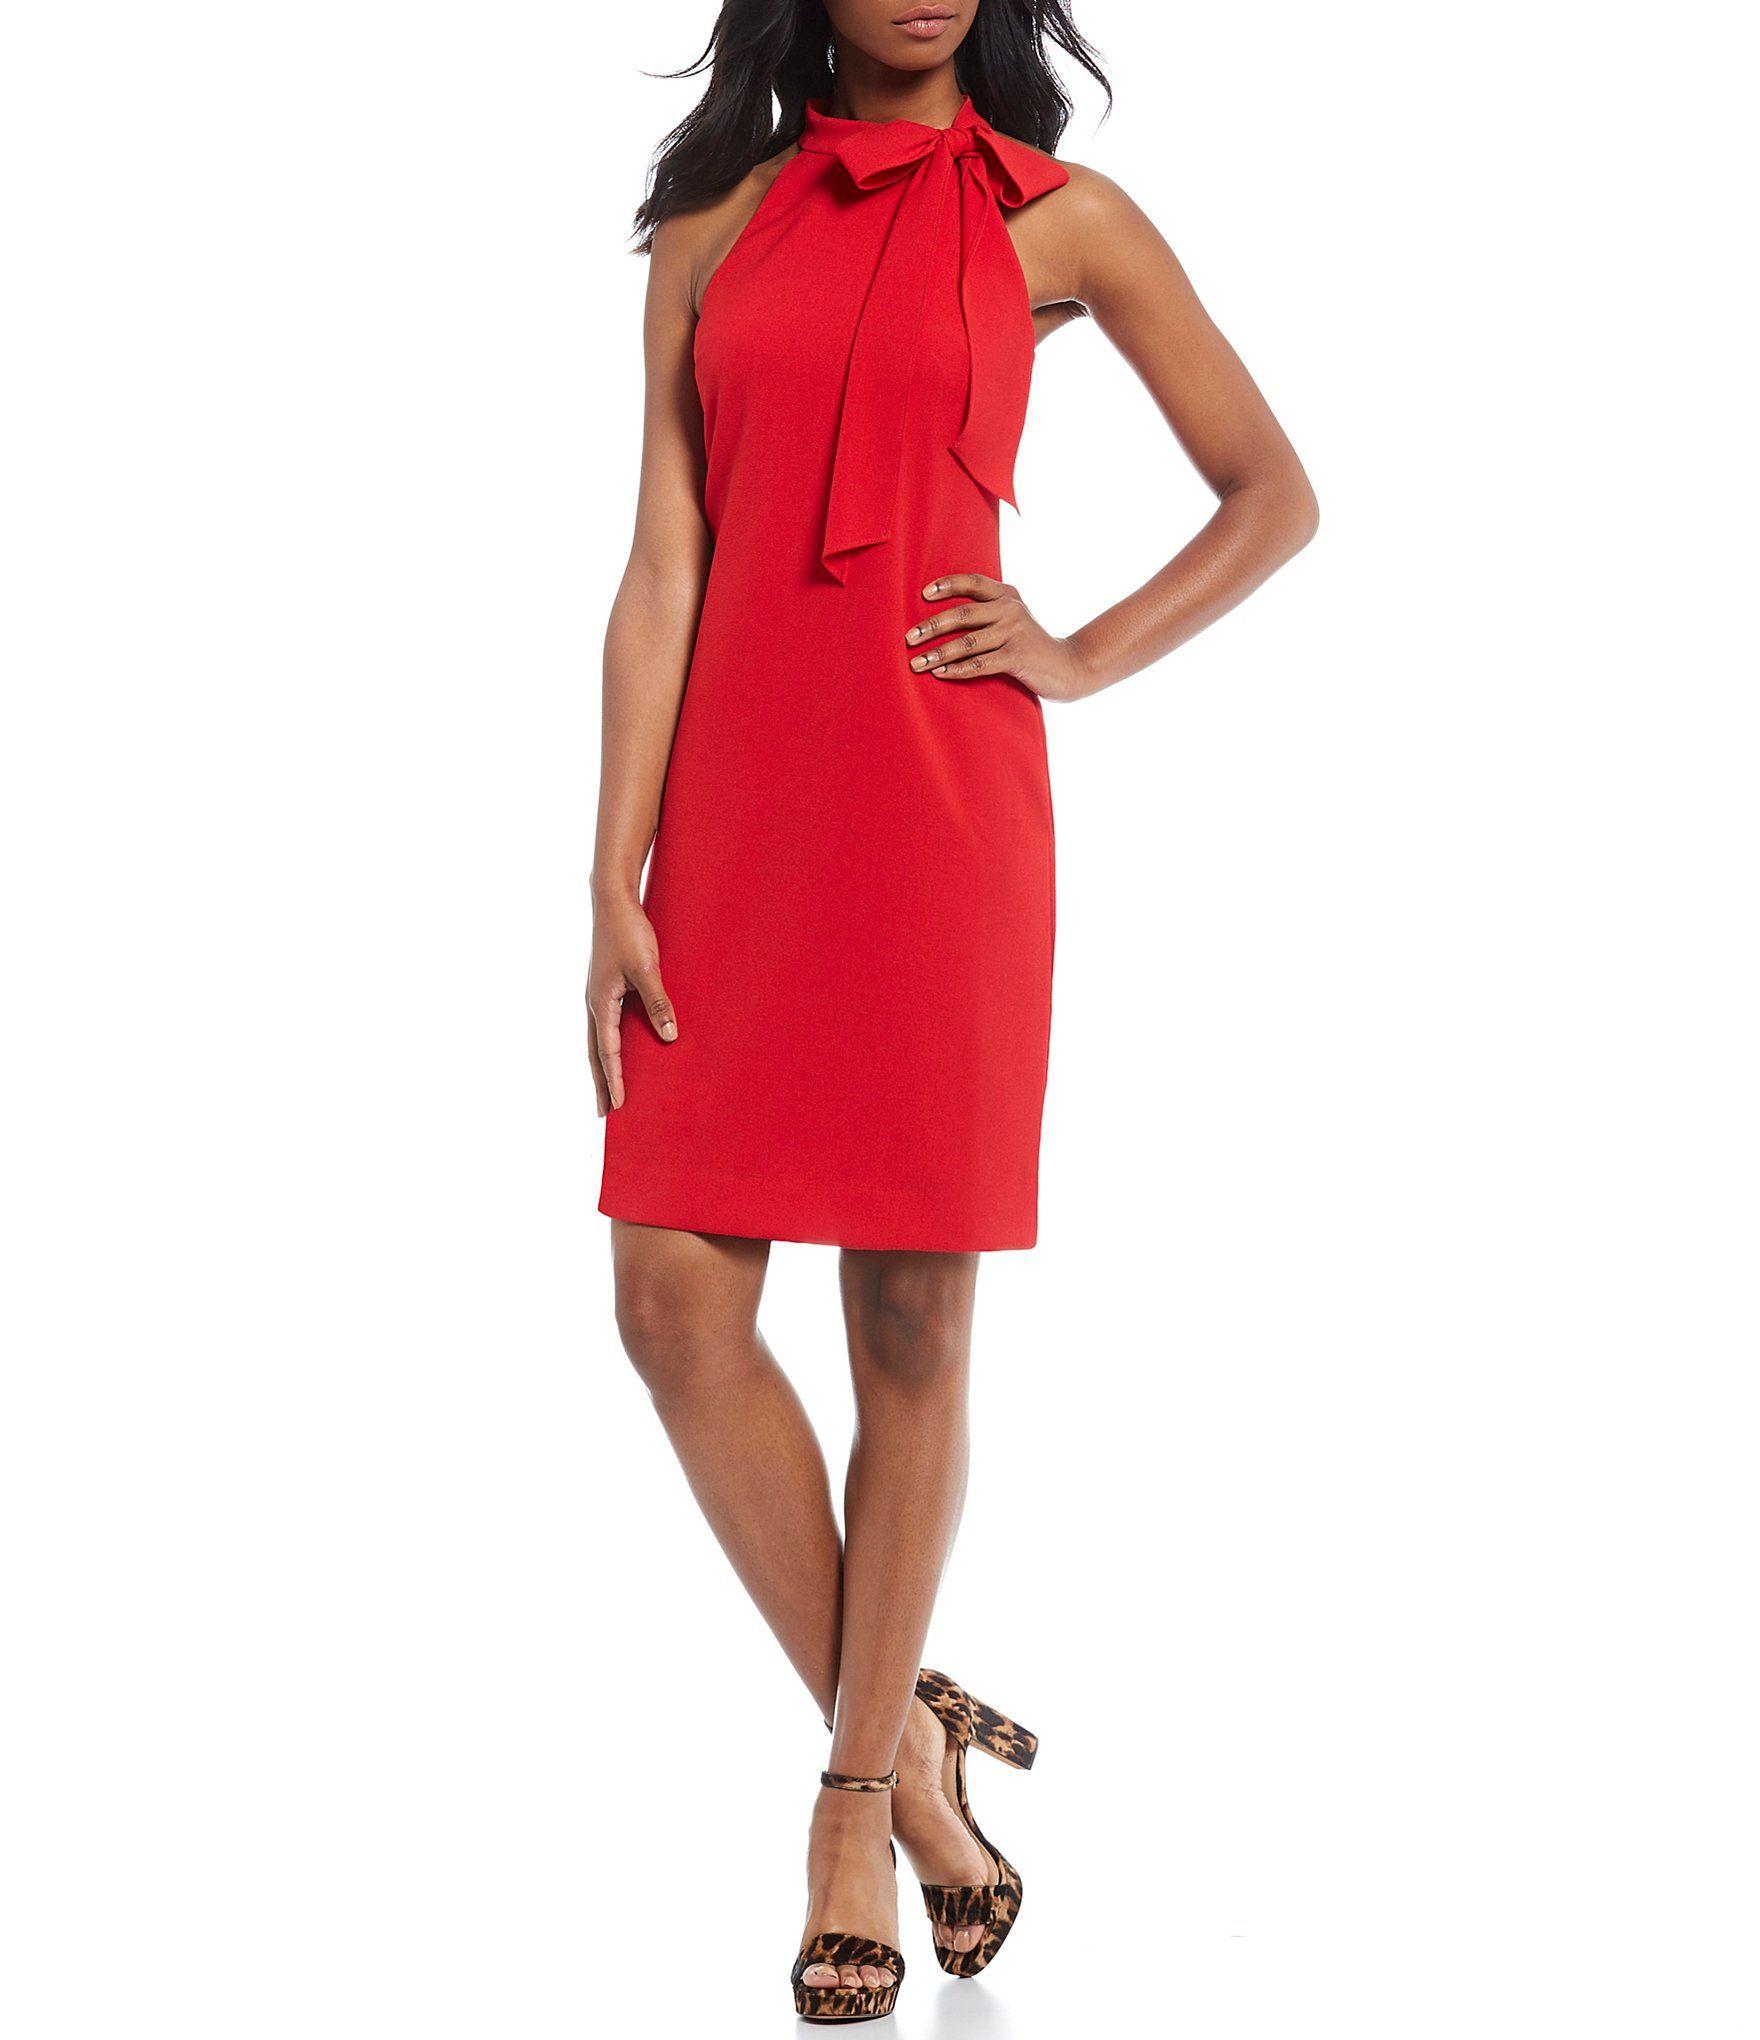 Vince Camuto Halter Neck Sleeveless Shift Dress Dillard S Red Shift Dress Shift Dress Sleeveless Shift Dress [ 2040 x 1760 Pixel ]